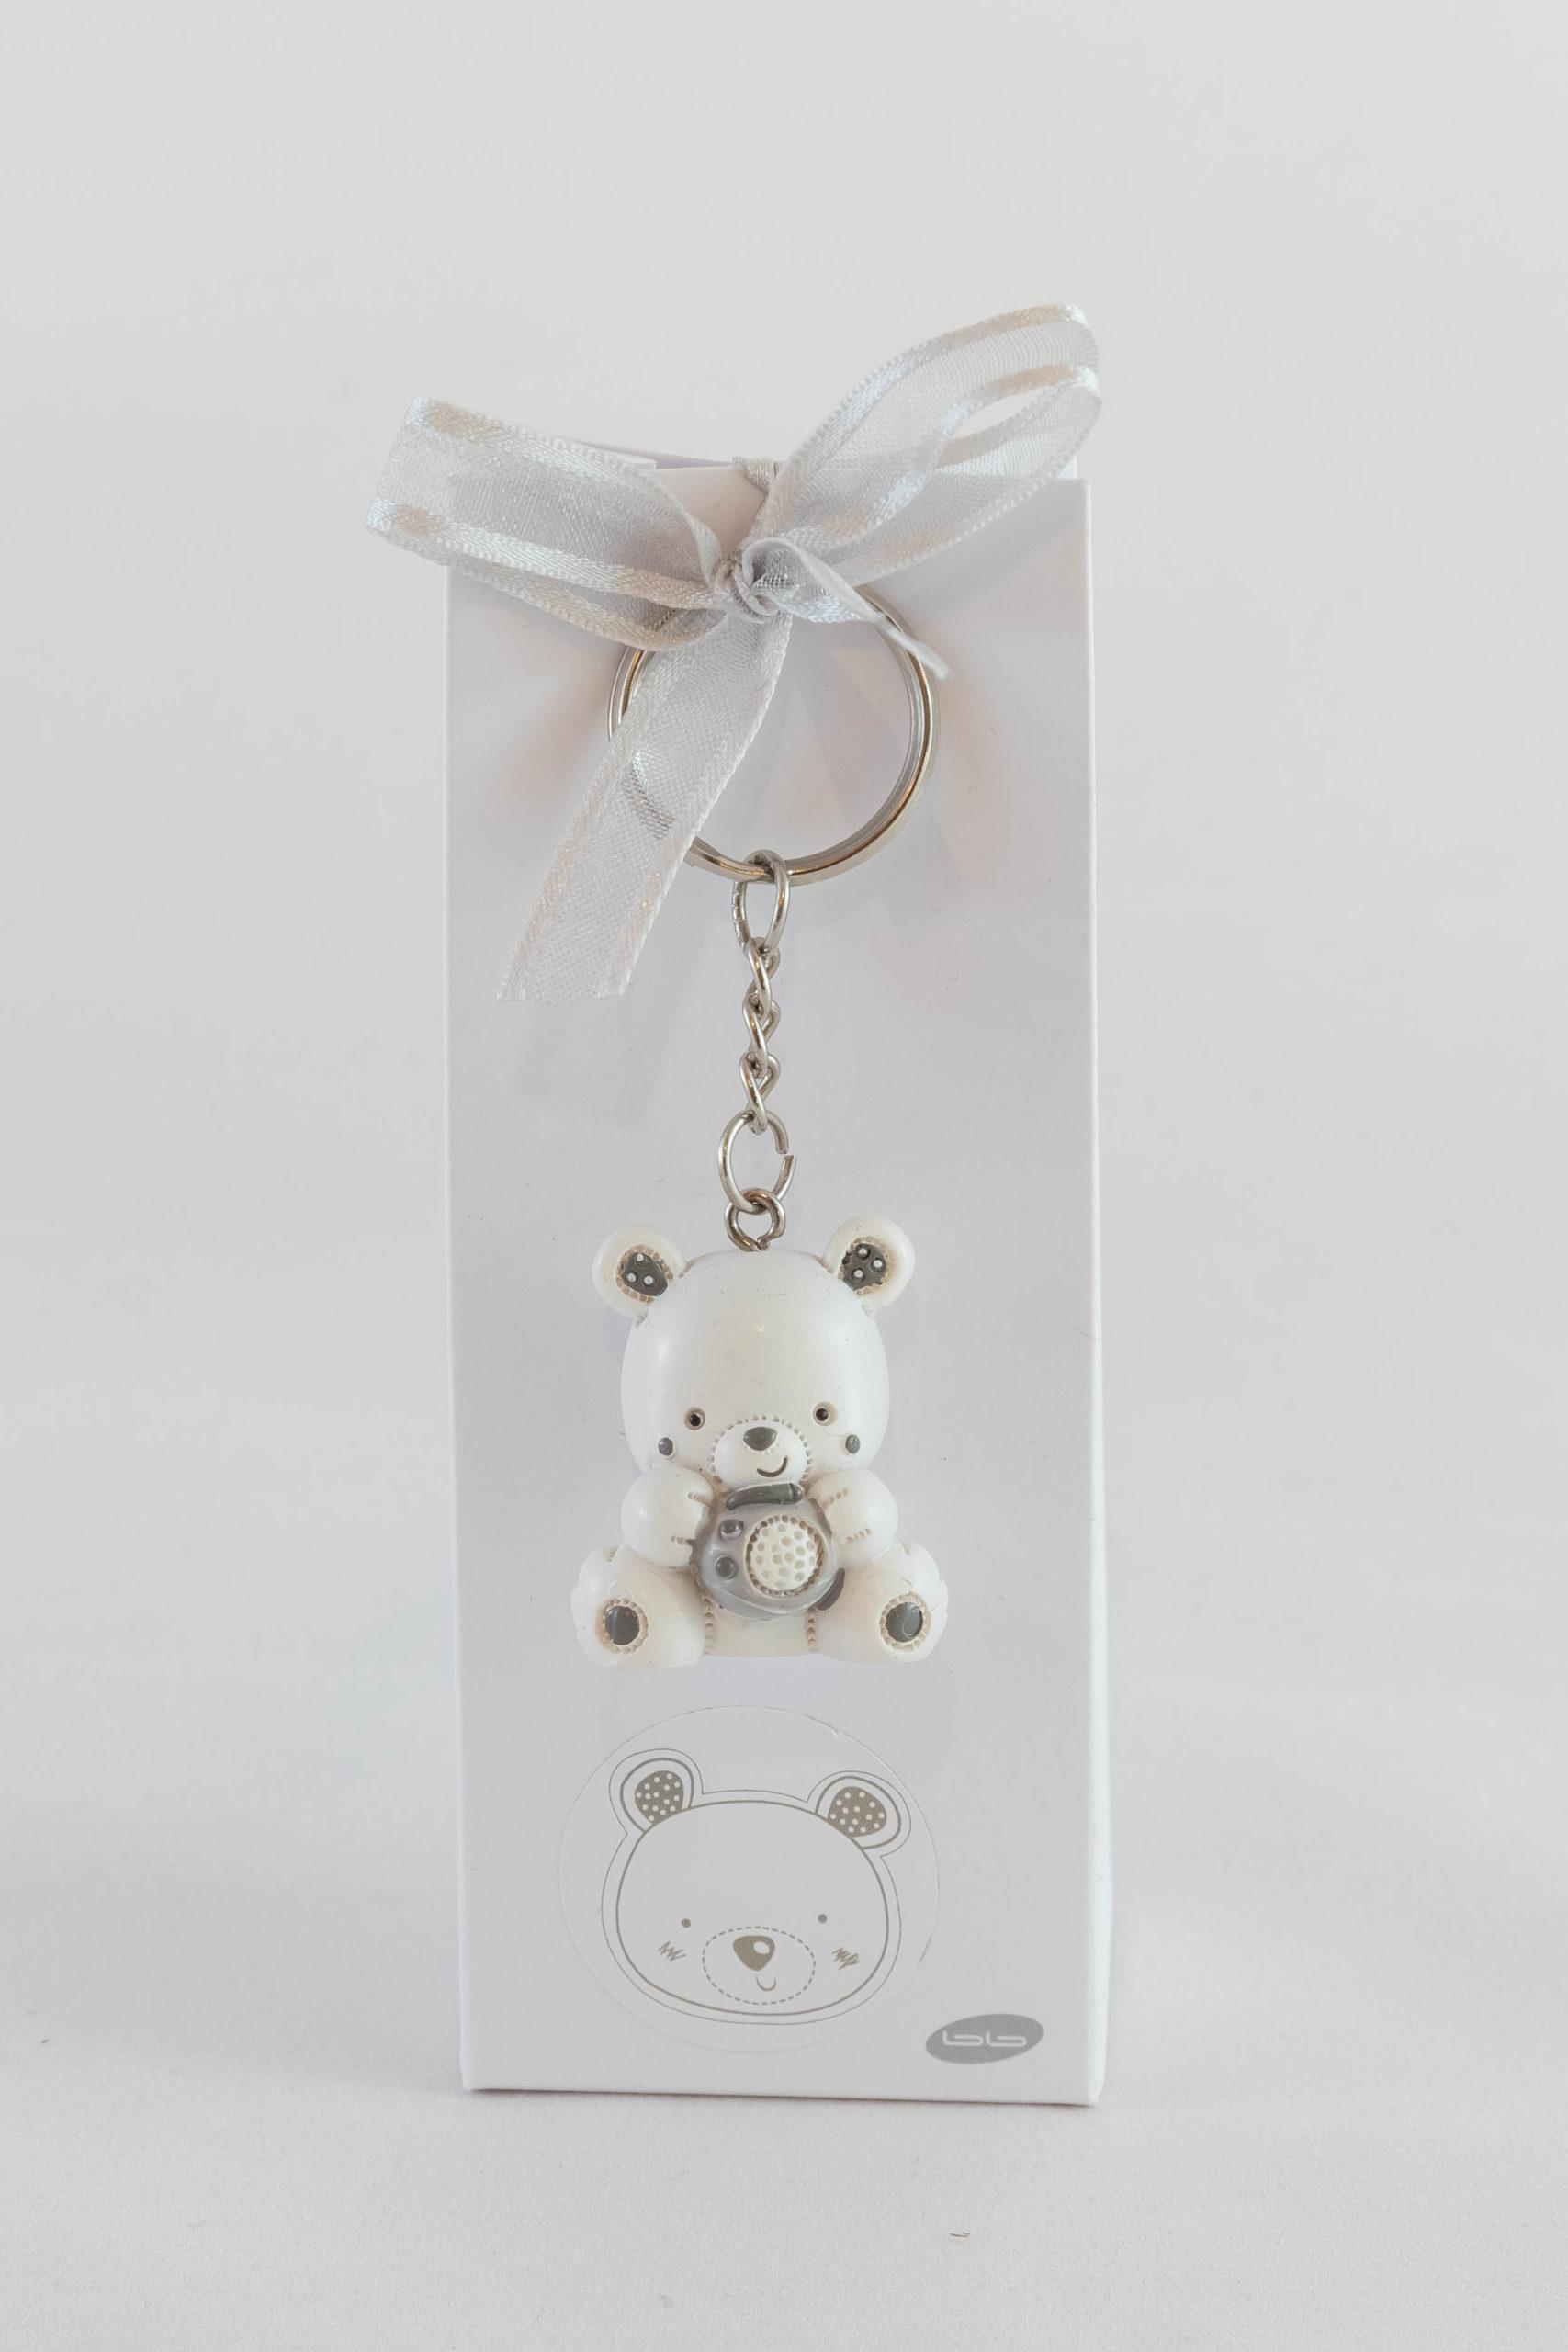 Boite porte-clé - Ourson blanc Image